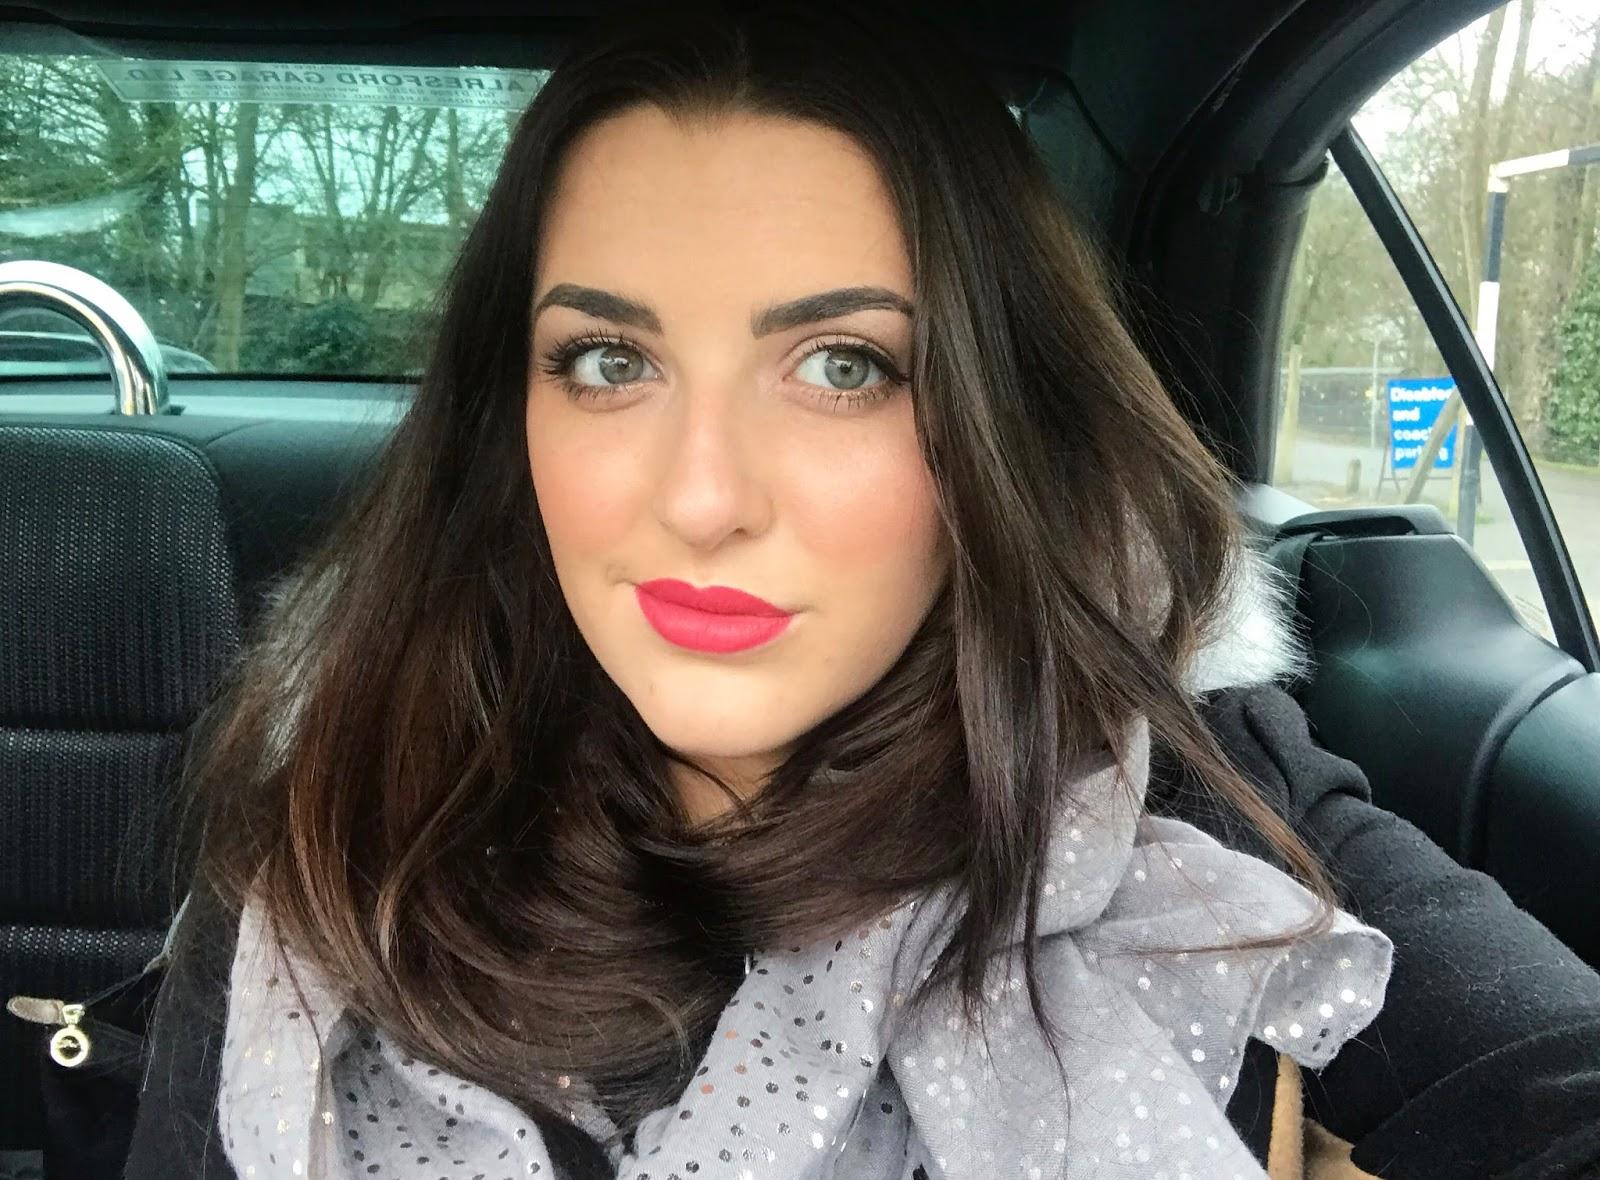 NARS Audacious Lipstick Shade Natalie & NARS lip liner Menton - Review & Swatches